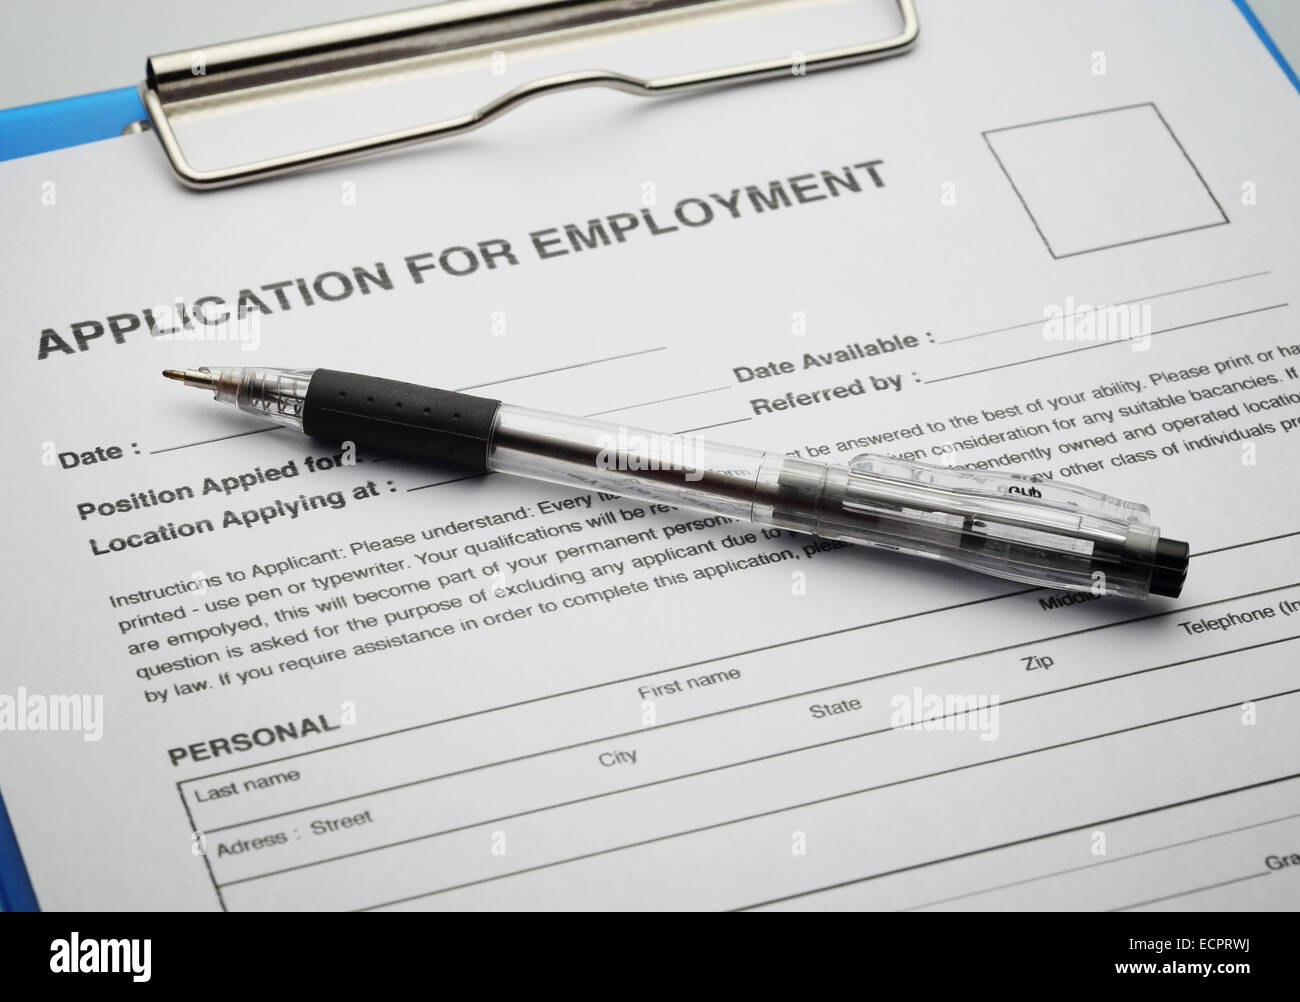 Job Application Form Stock Photos & Job Application Form Stock ...